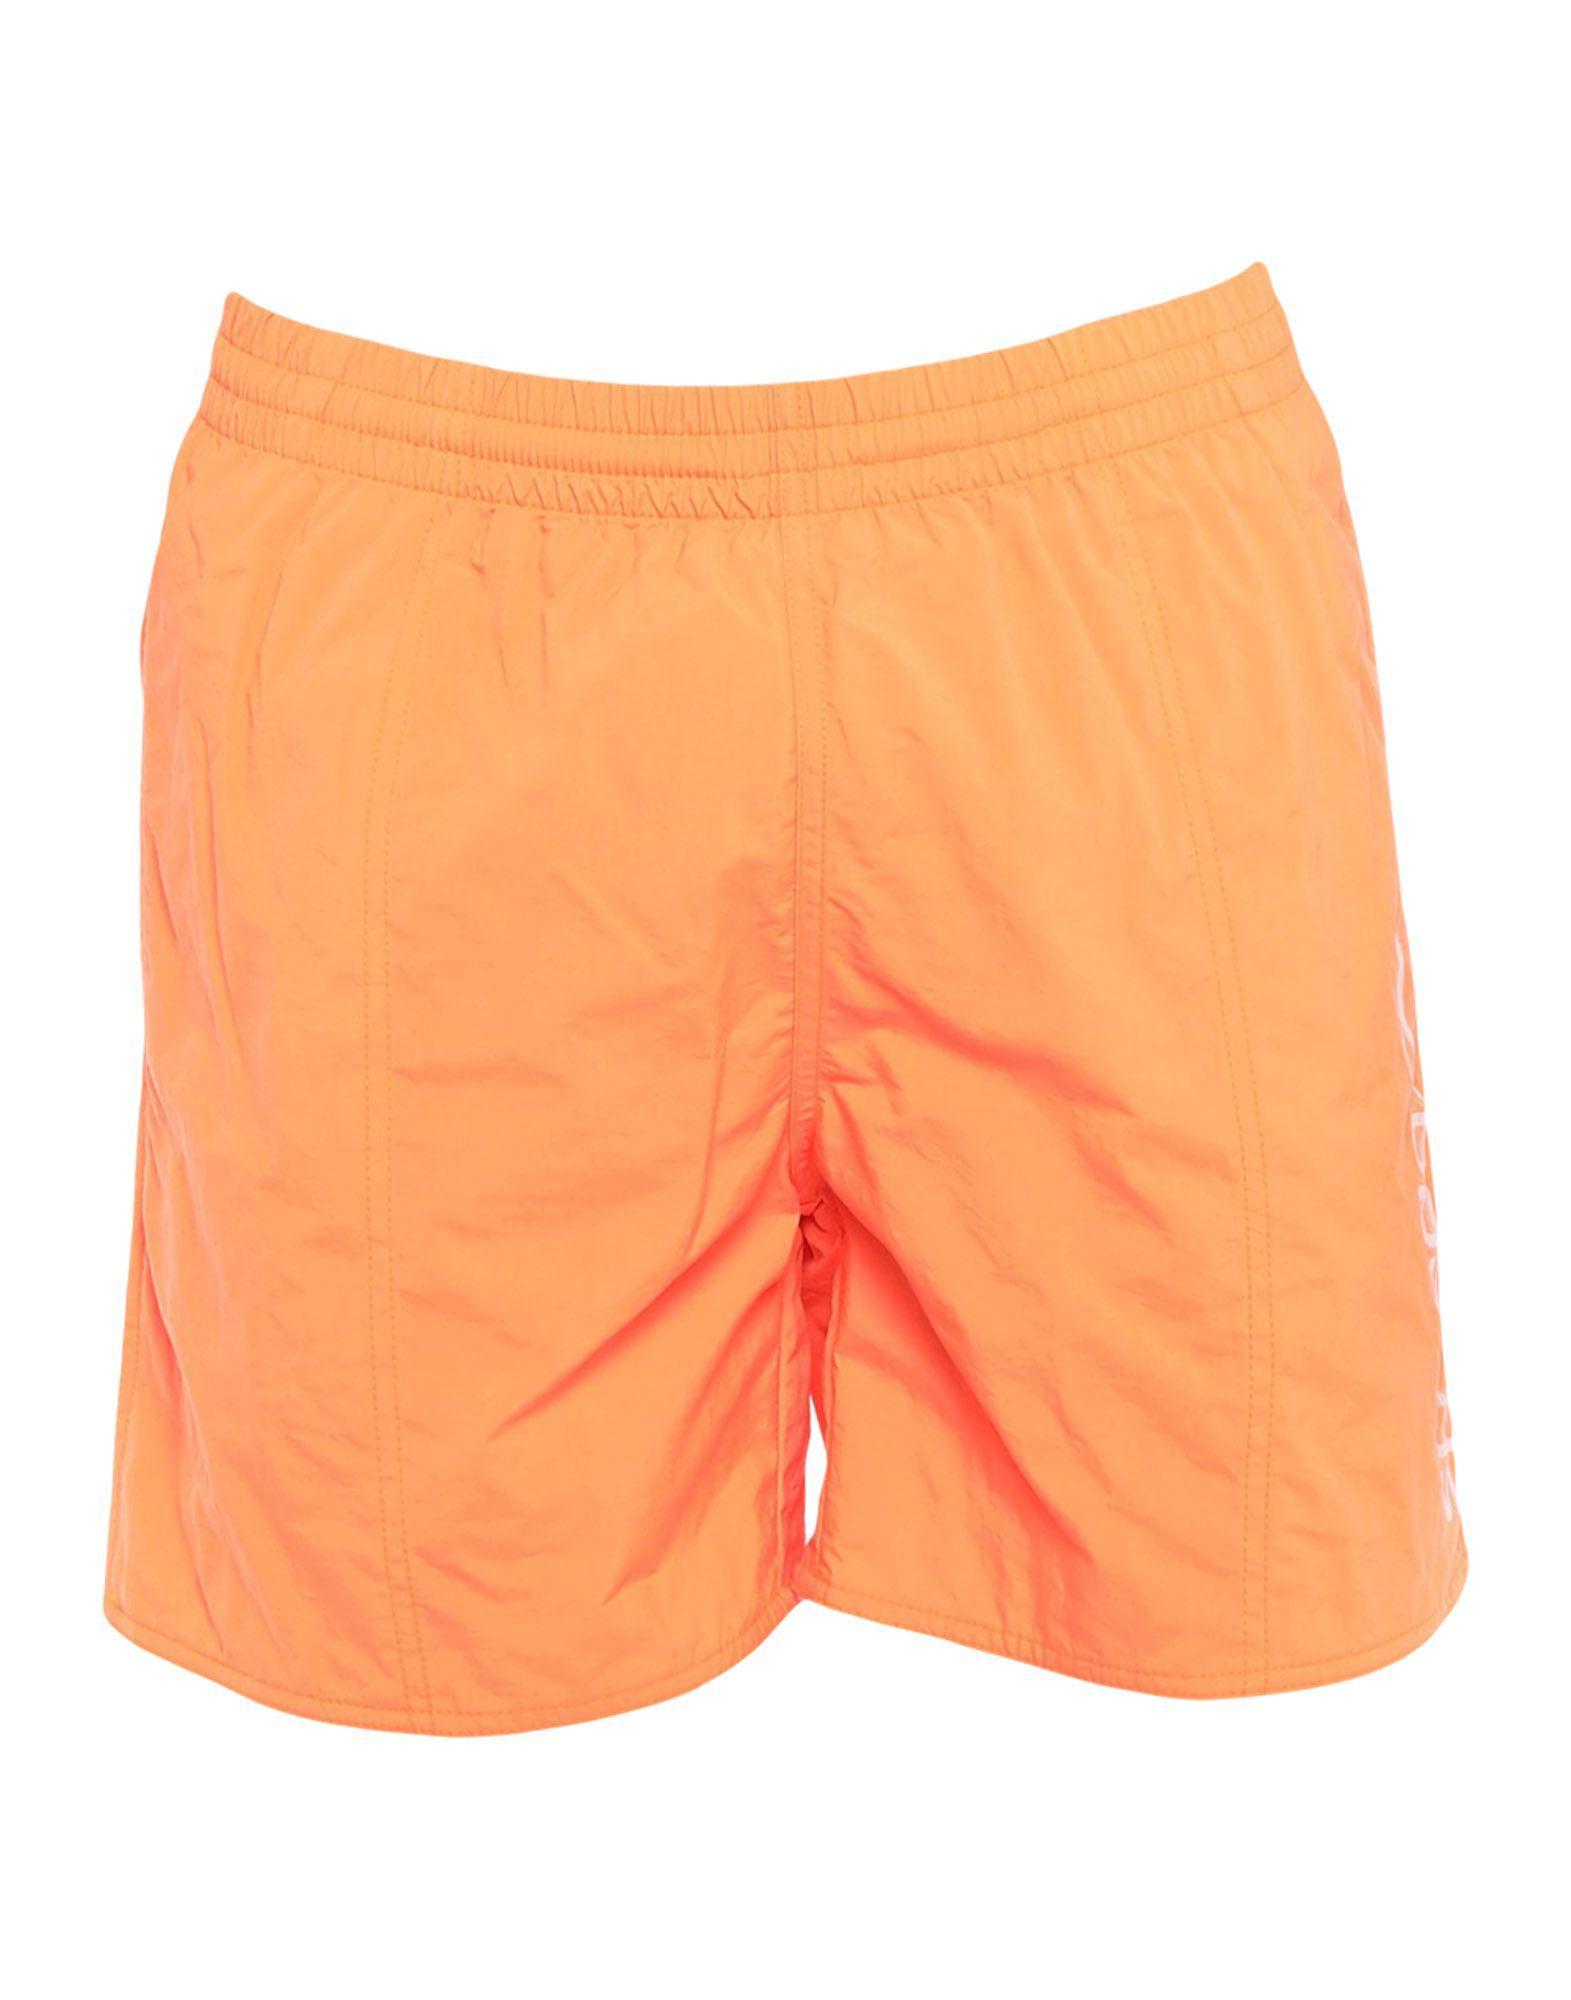 18276fa2a1 Lyst - Speedo Swimming Trunks in Orange for Men - Save 26%